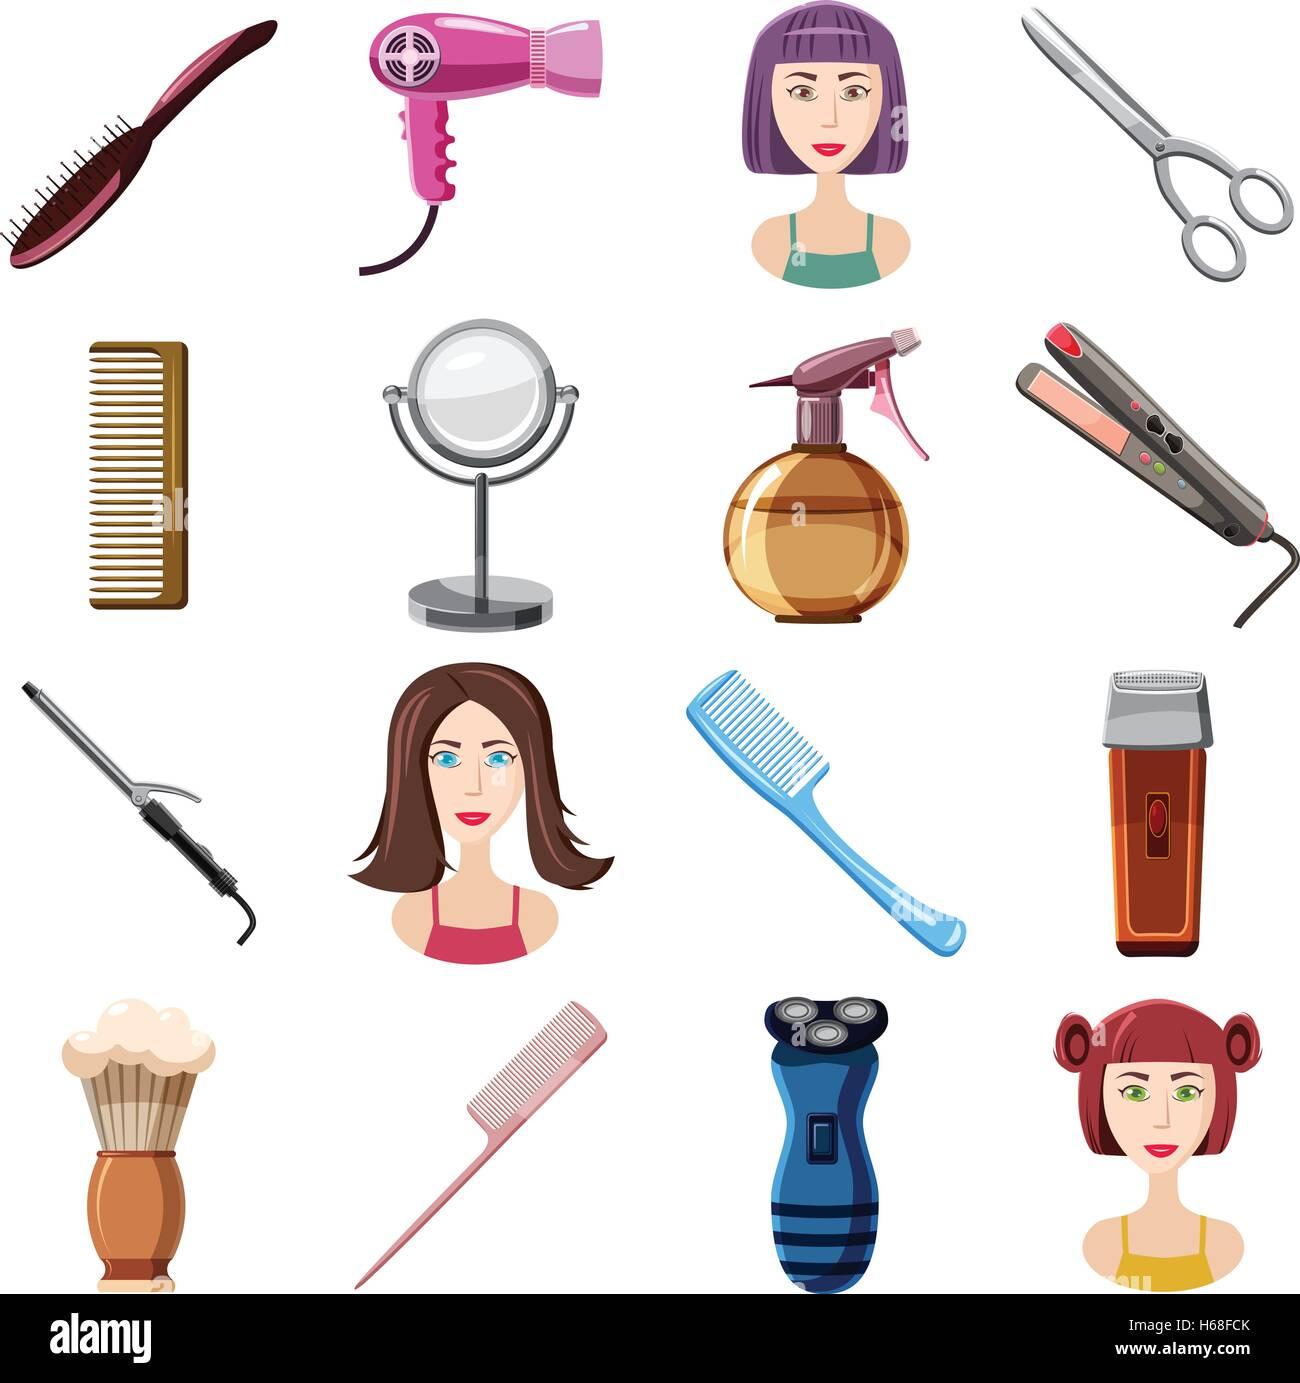 Hairdresser icons set, cartoon style - Stock Image